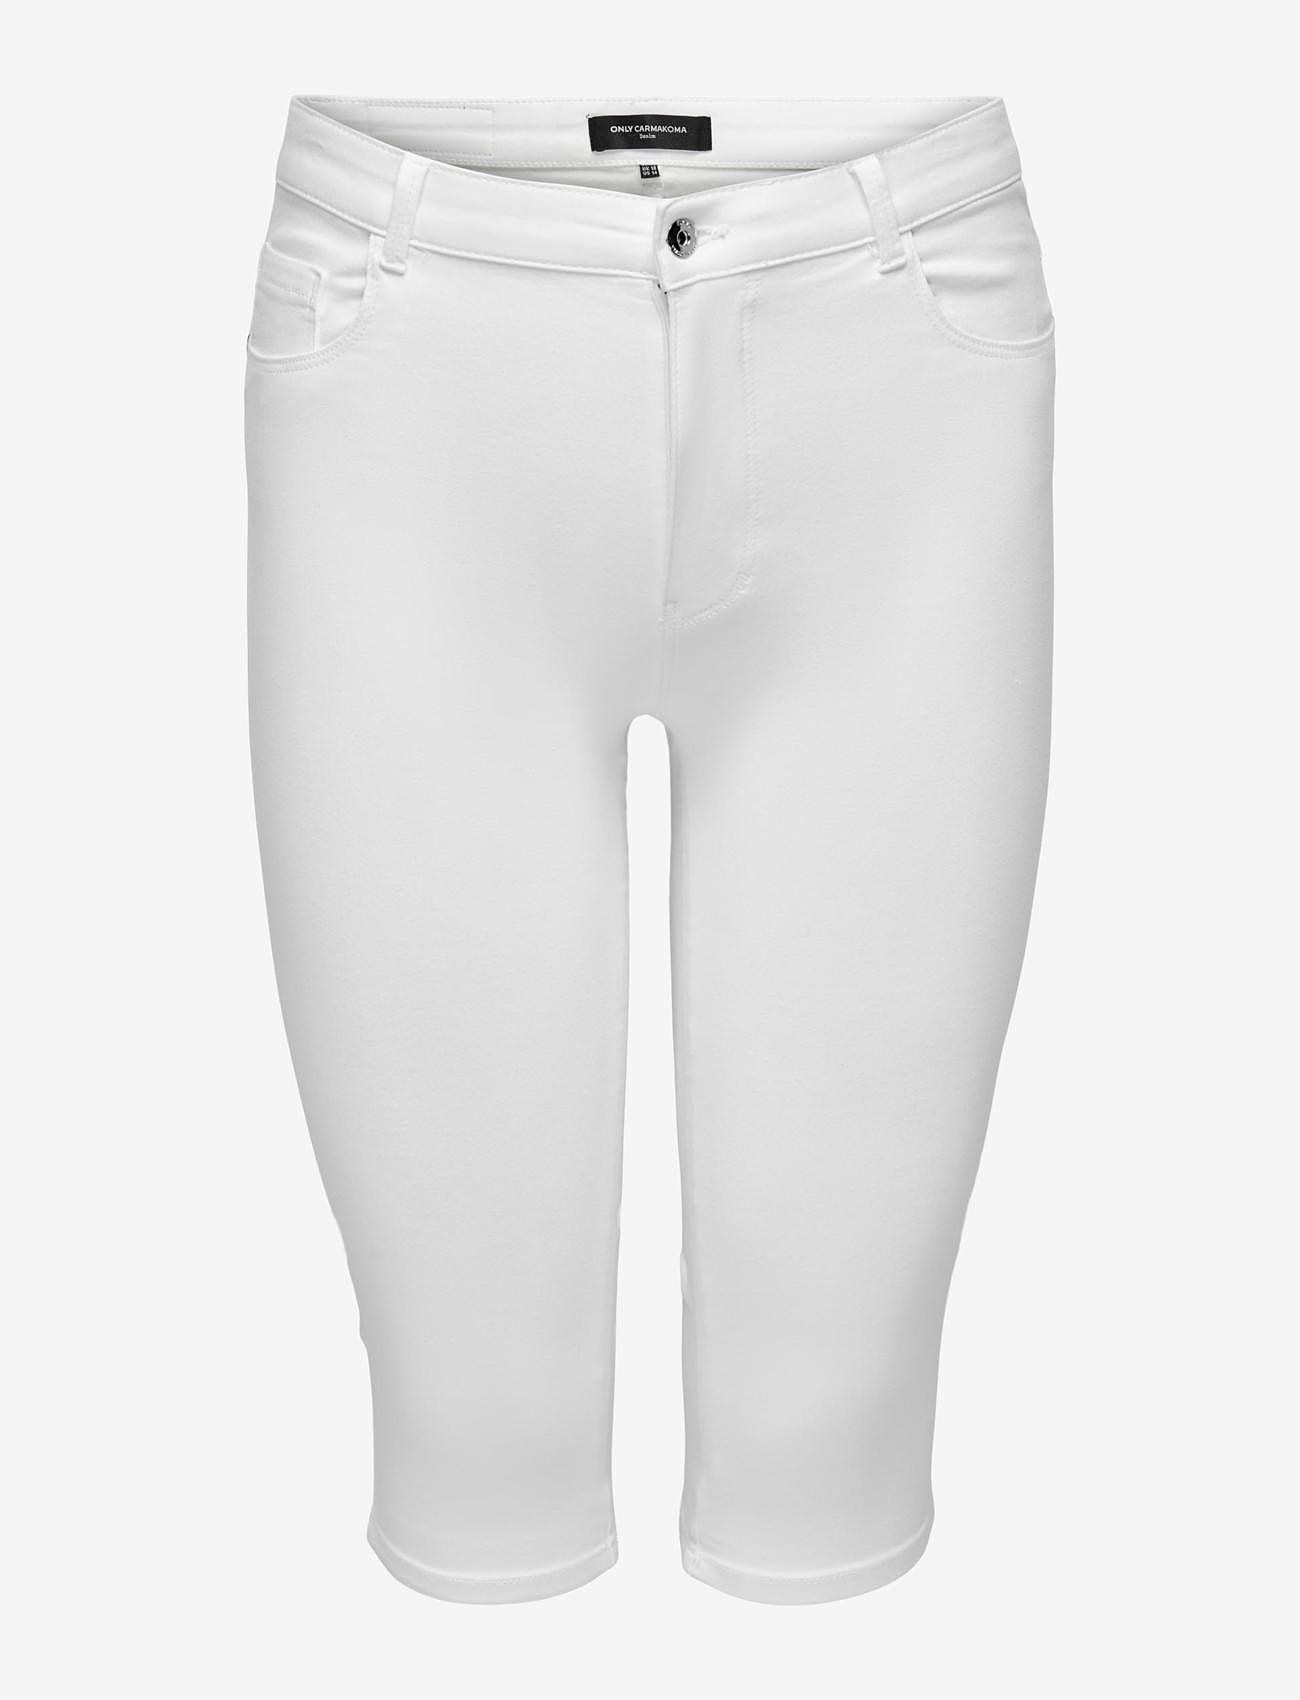 ONLY Carmakoma - CARAUGUSTA LIFE HW SKINNY KNICKERS WHITE - pantalons capri - white - 0